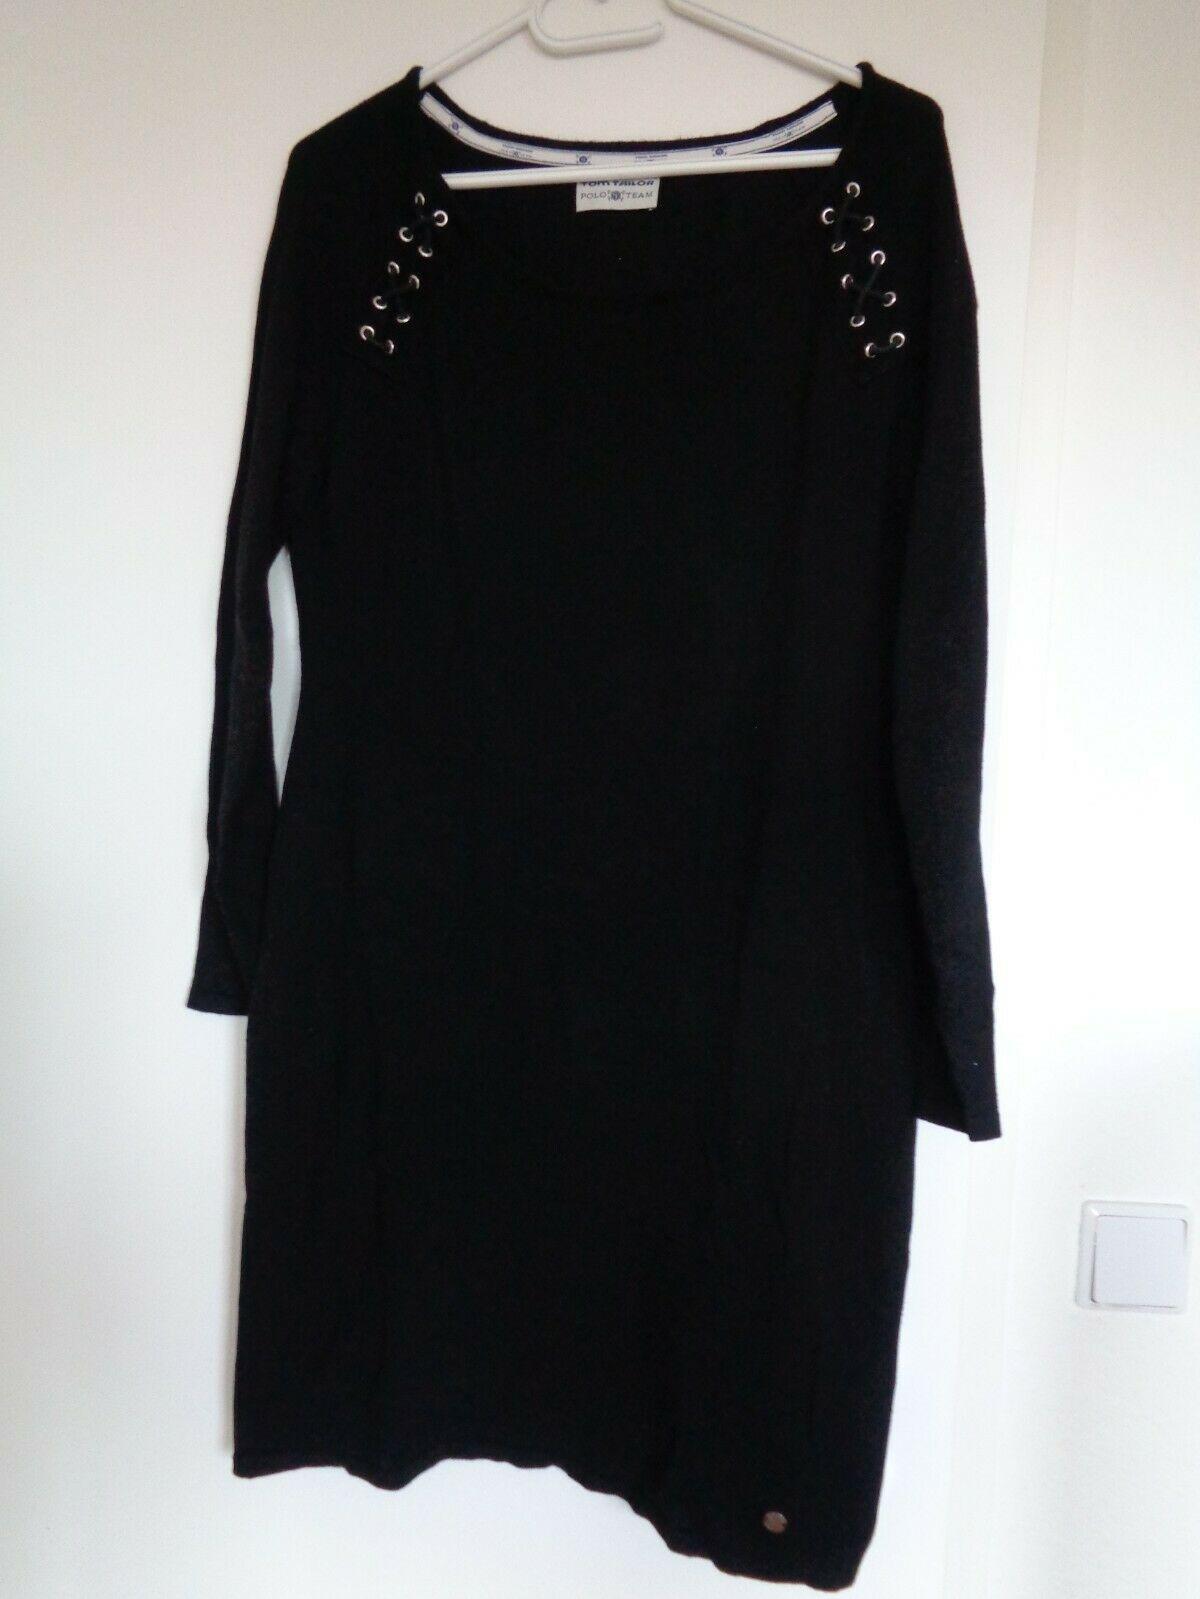 mein ebay: aktiv in 2020 | kleider, strickkleid, modestil